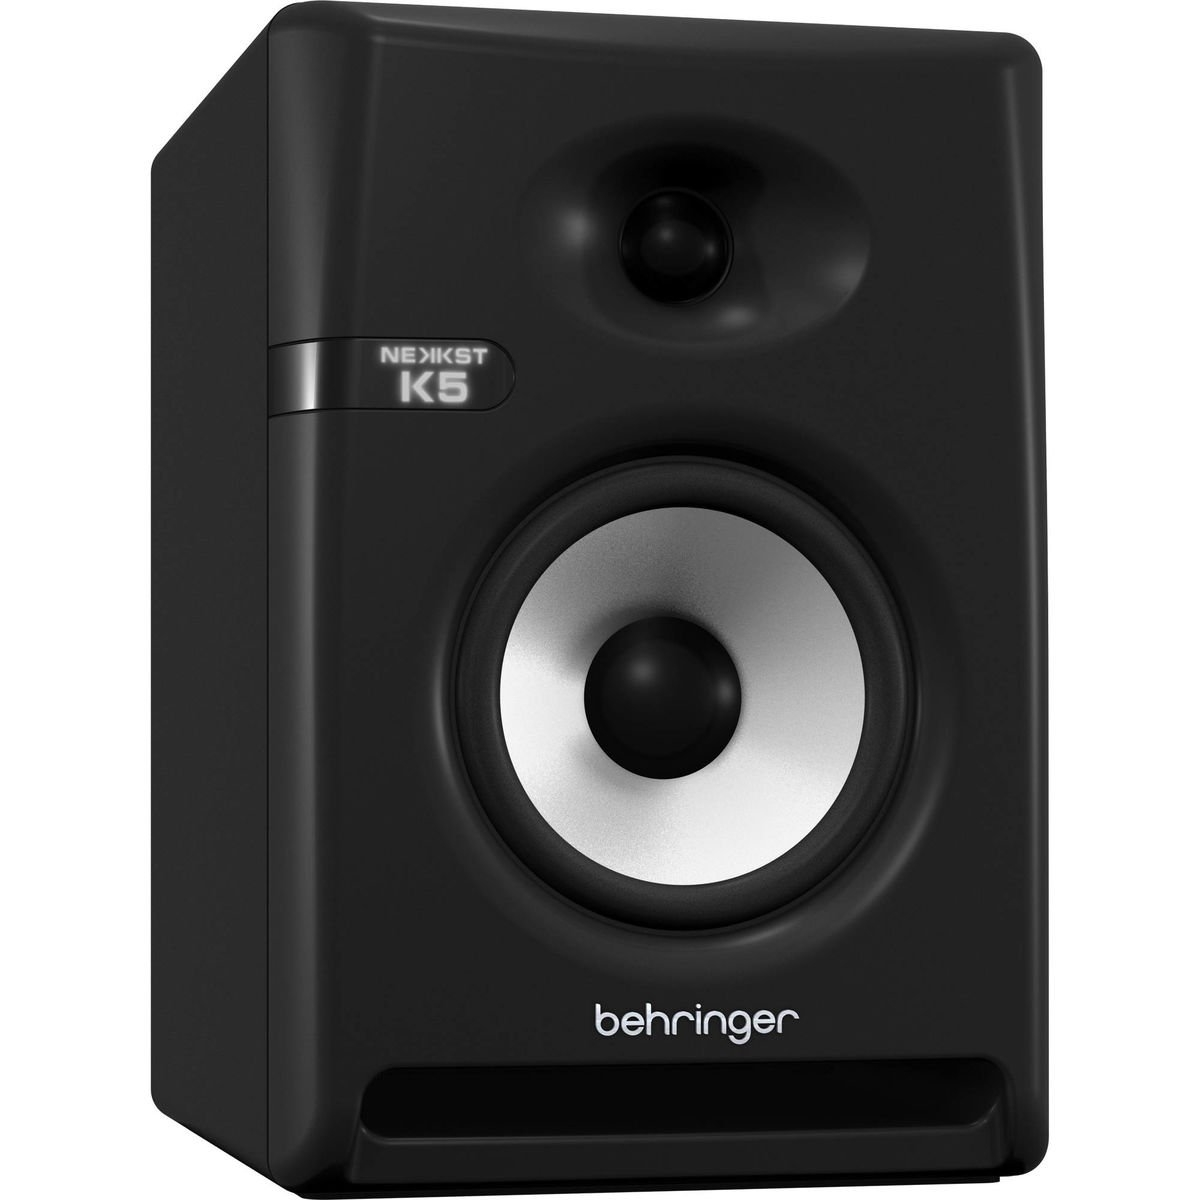 Monitor de Referência Behringer NEkkST K5 150w Individual  - MegaLojaSP